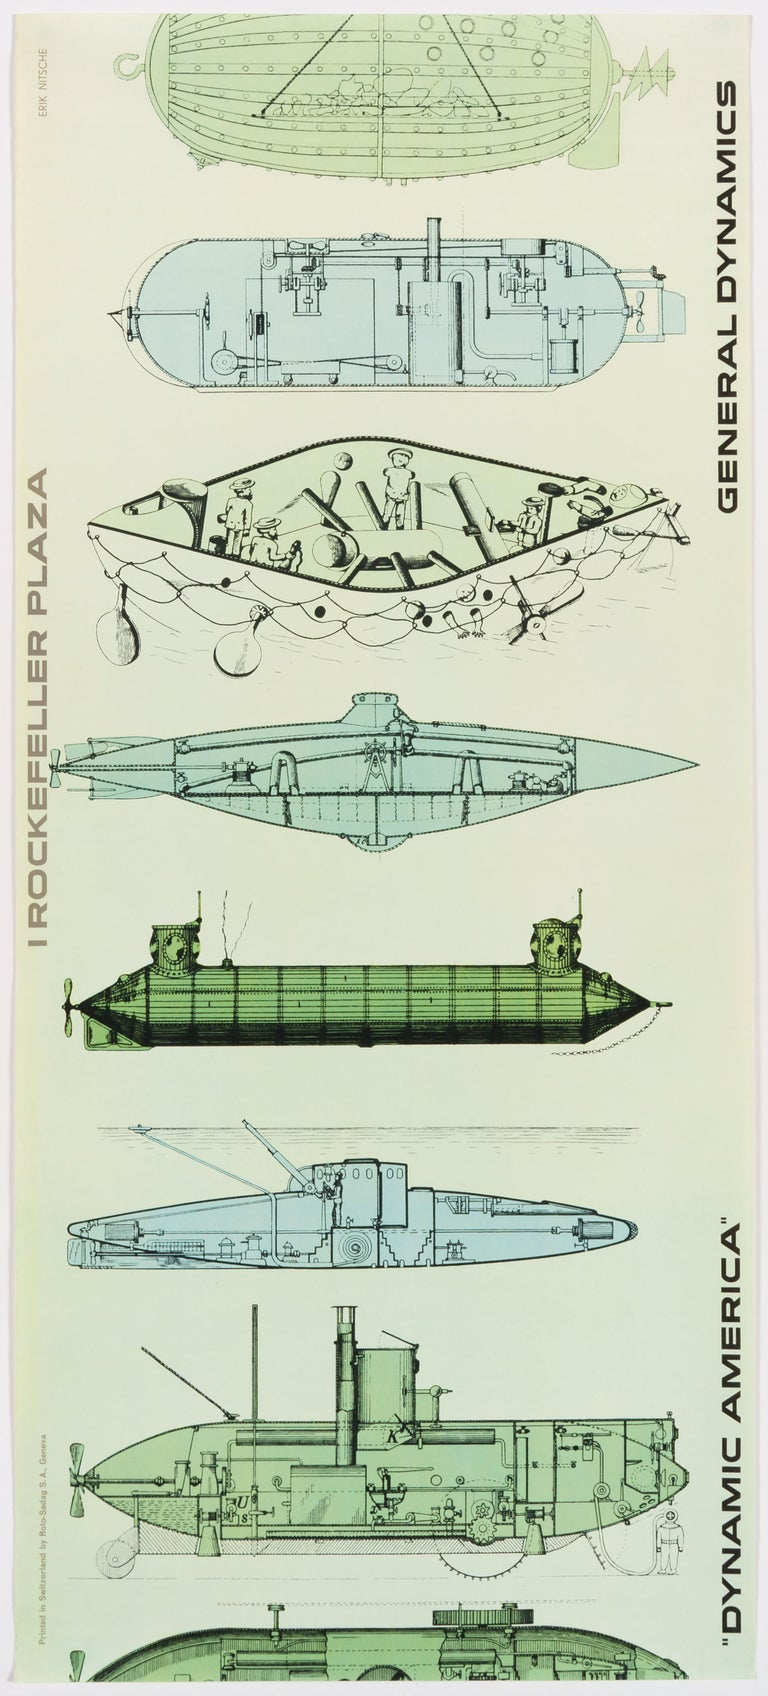 Erik Nitsche Print - General Dynamics, Exhibition Dynamic America, New York – Original Vintage Poster